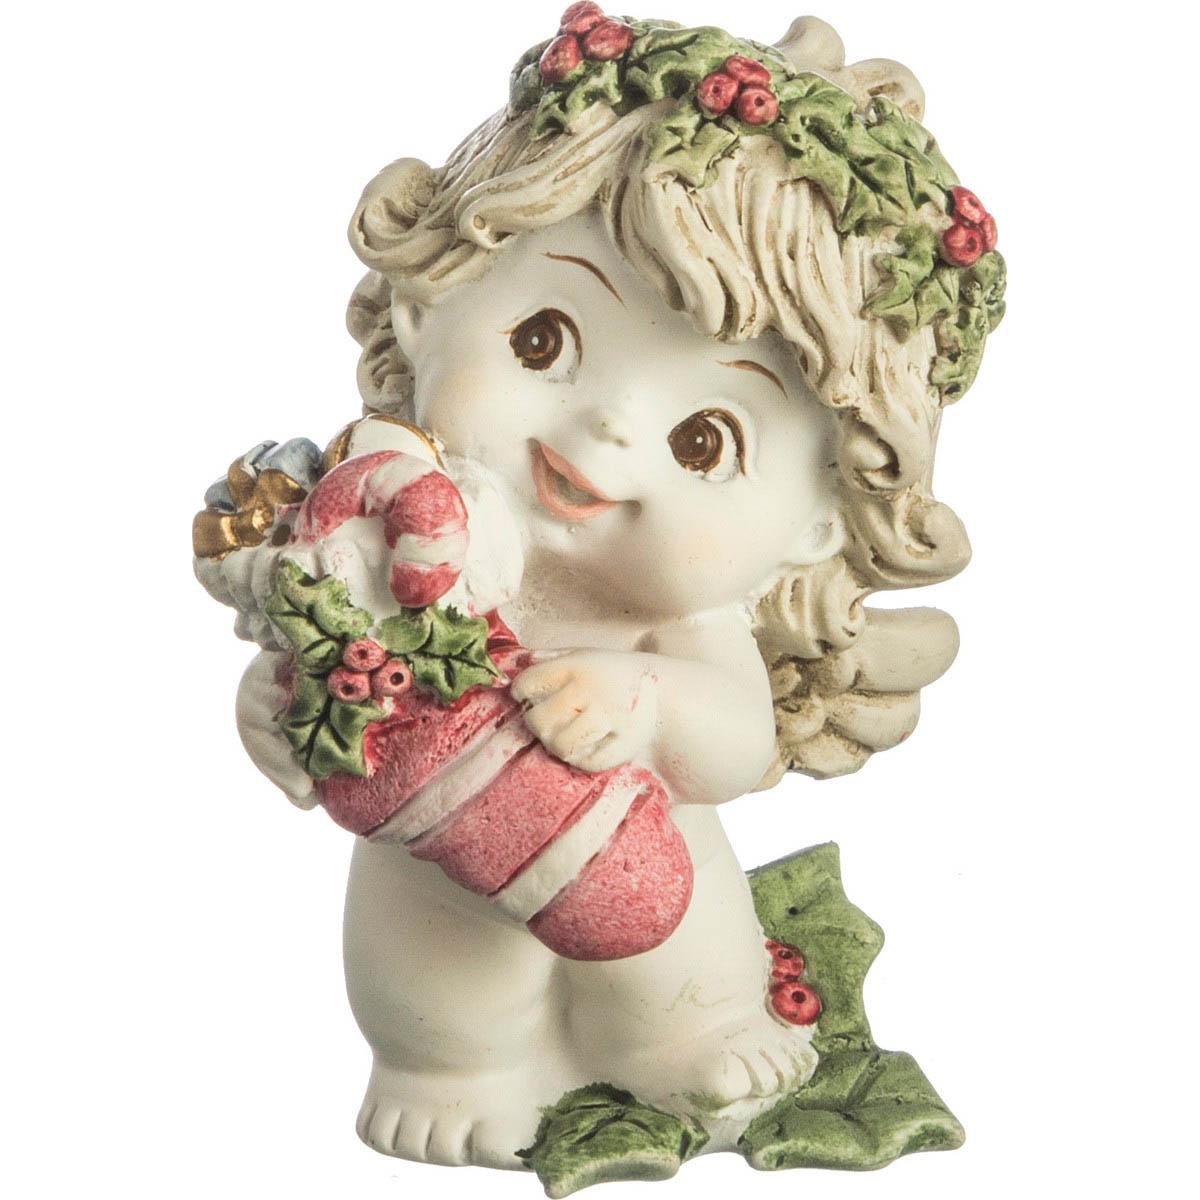 {} Lefard Интерьерная игрушка Amore (6 см) lefard интерьерная игрушка jan 5х6х13 см